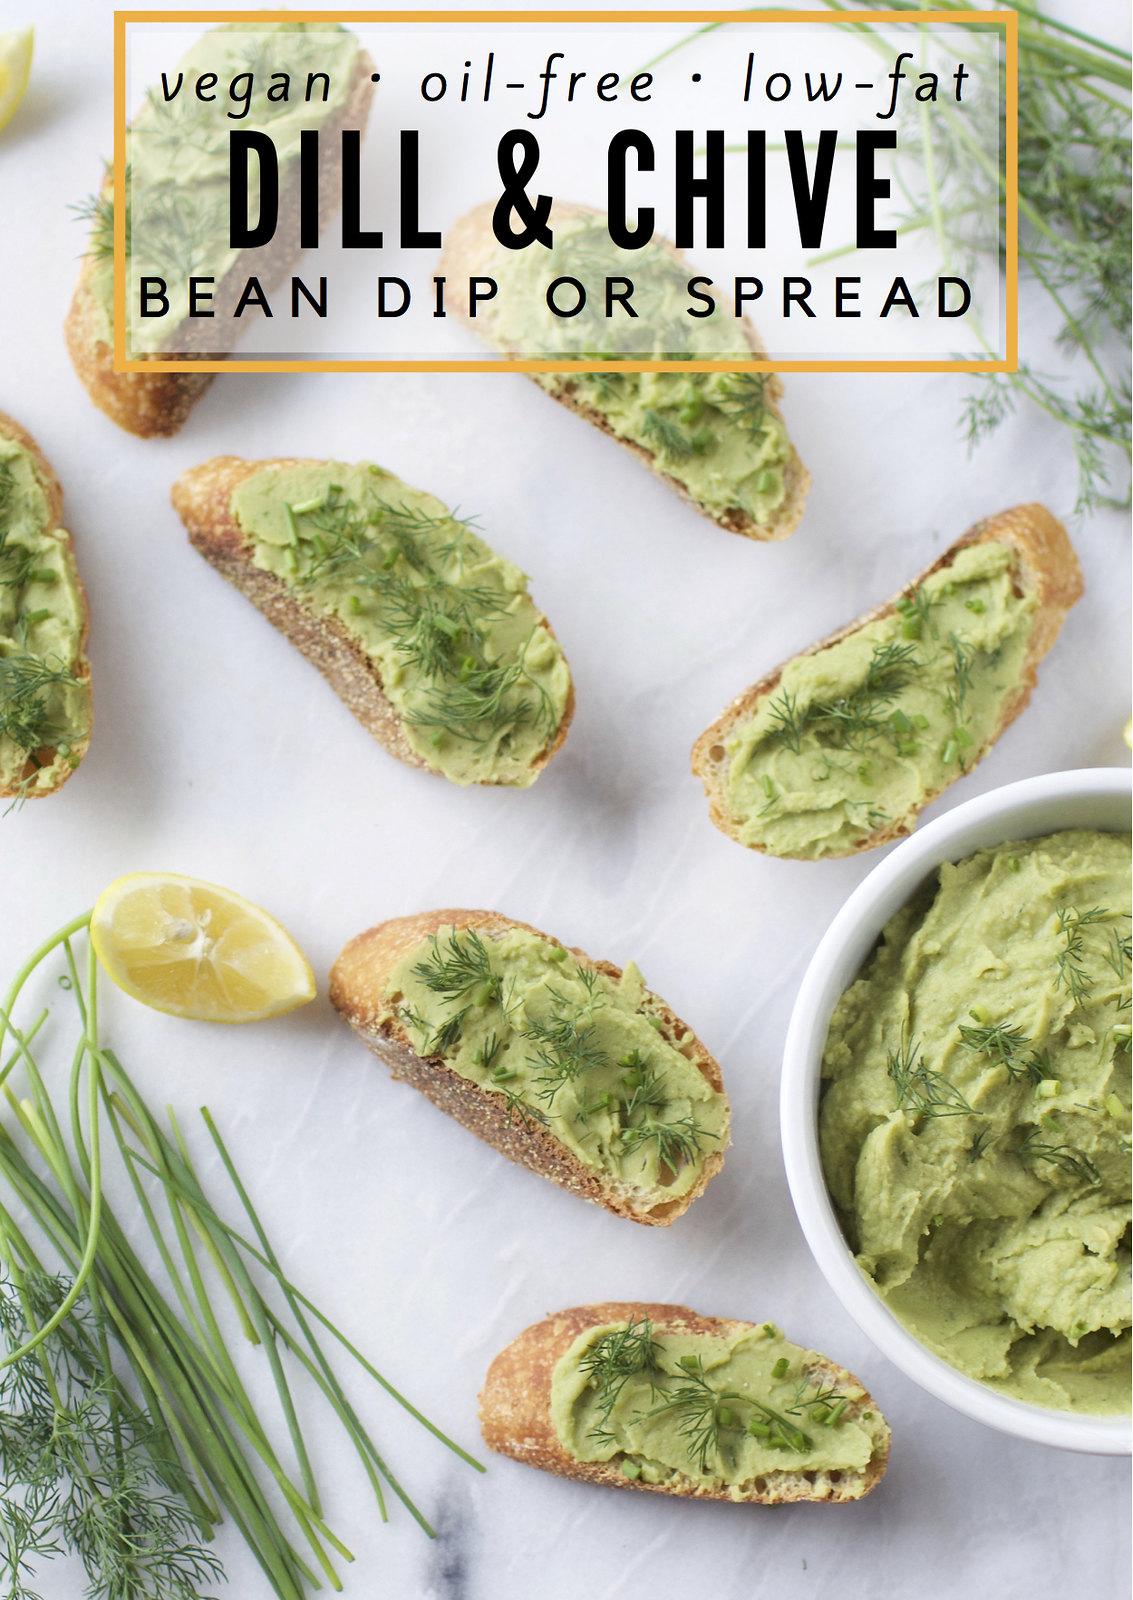 Dill & Chive Bean Dip Or Spread {Oil-Free, Low-Fat} sweetsimplevegan.com